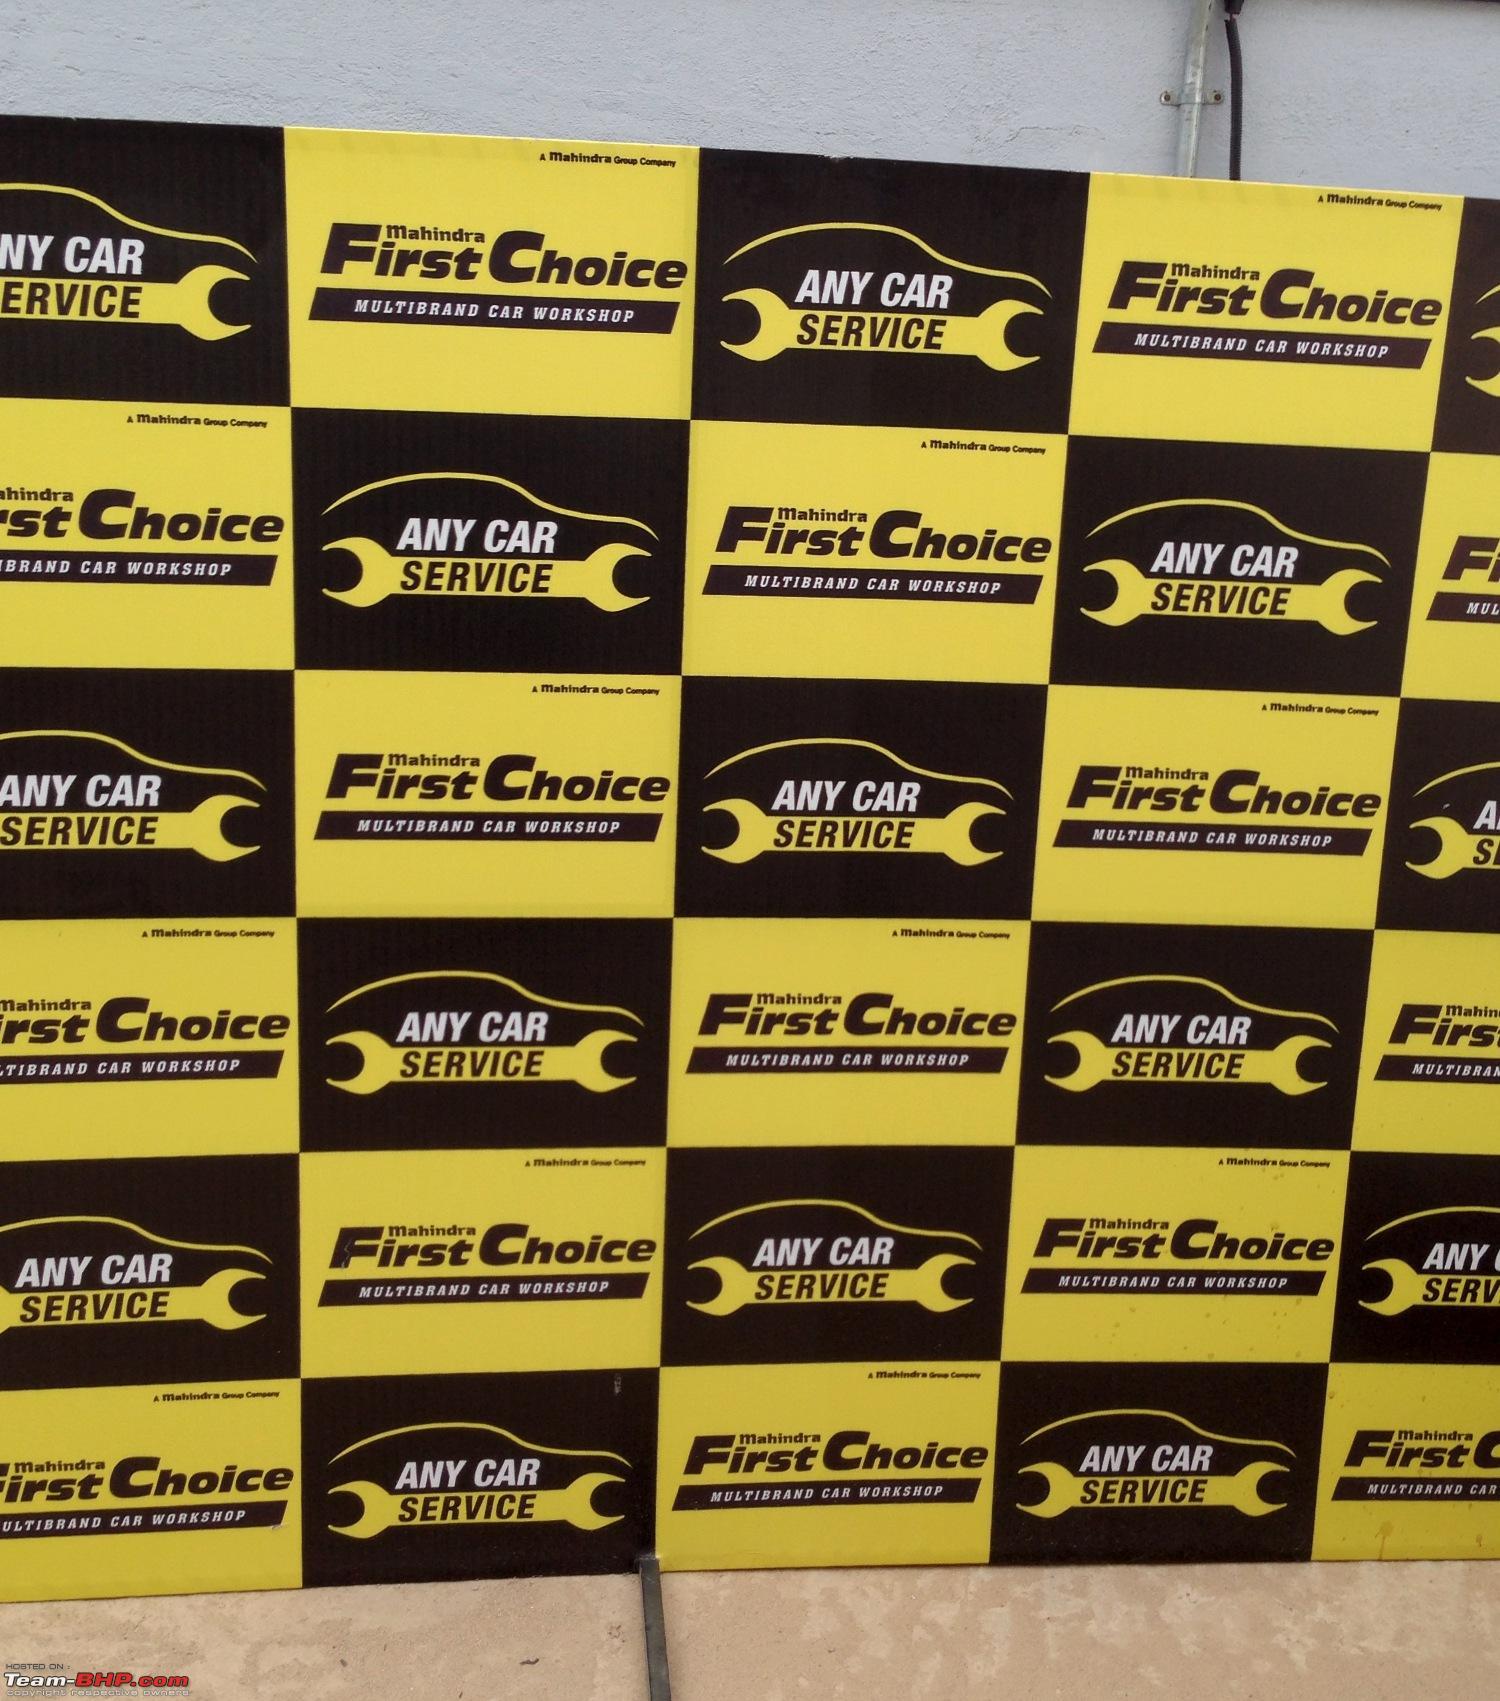 Multi Brand Car Service Mahindra First Choice Bangalore